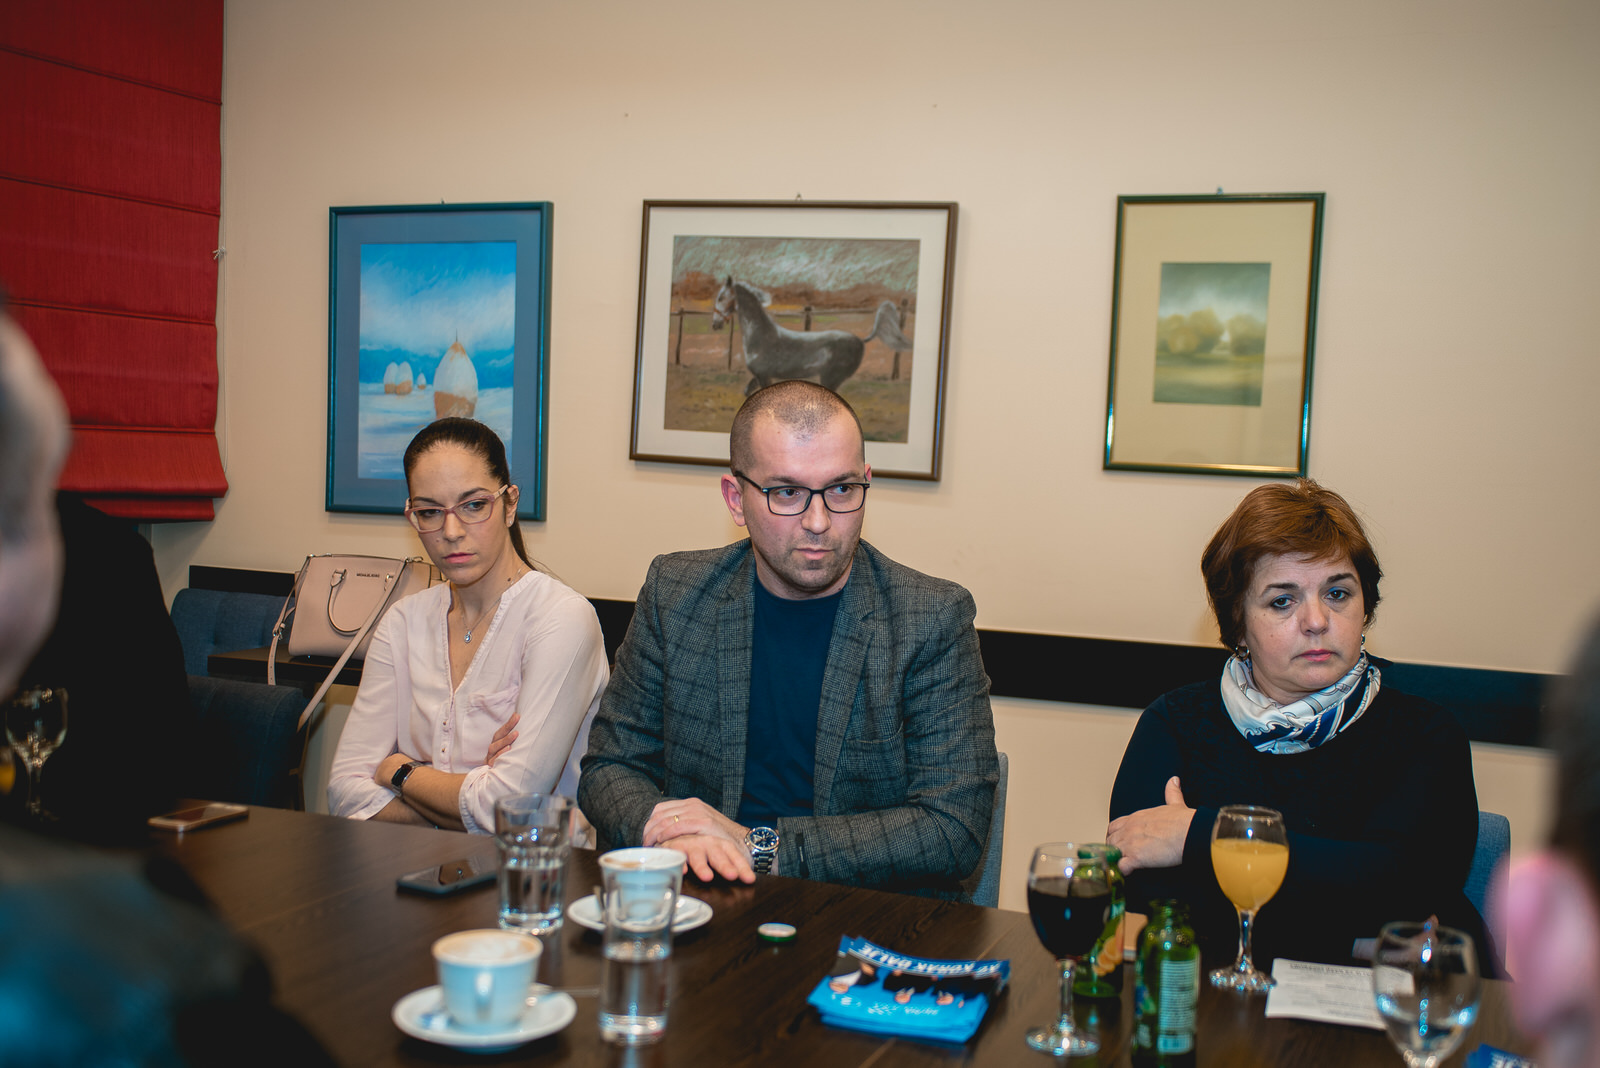 likaclub_bura-promjena_druženje-kostelac-otočac_2019-15